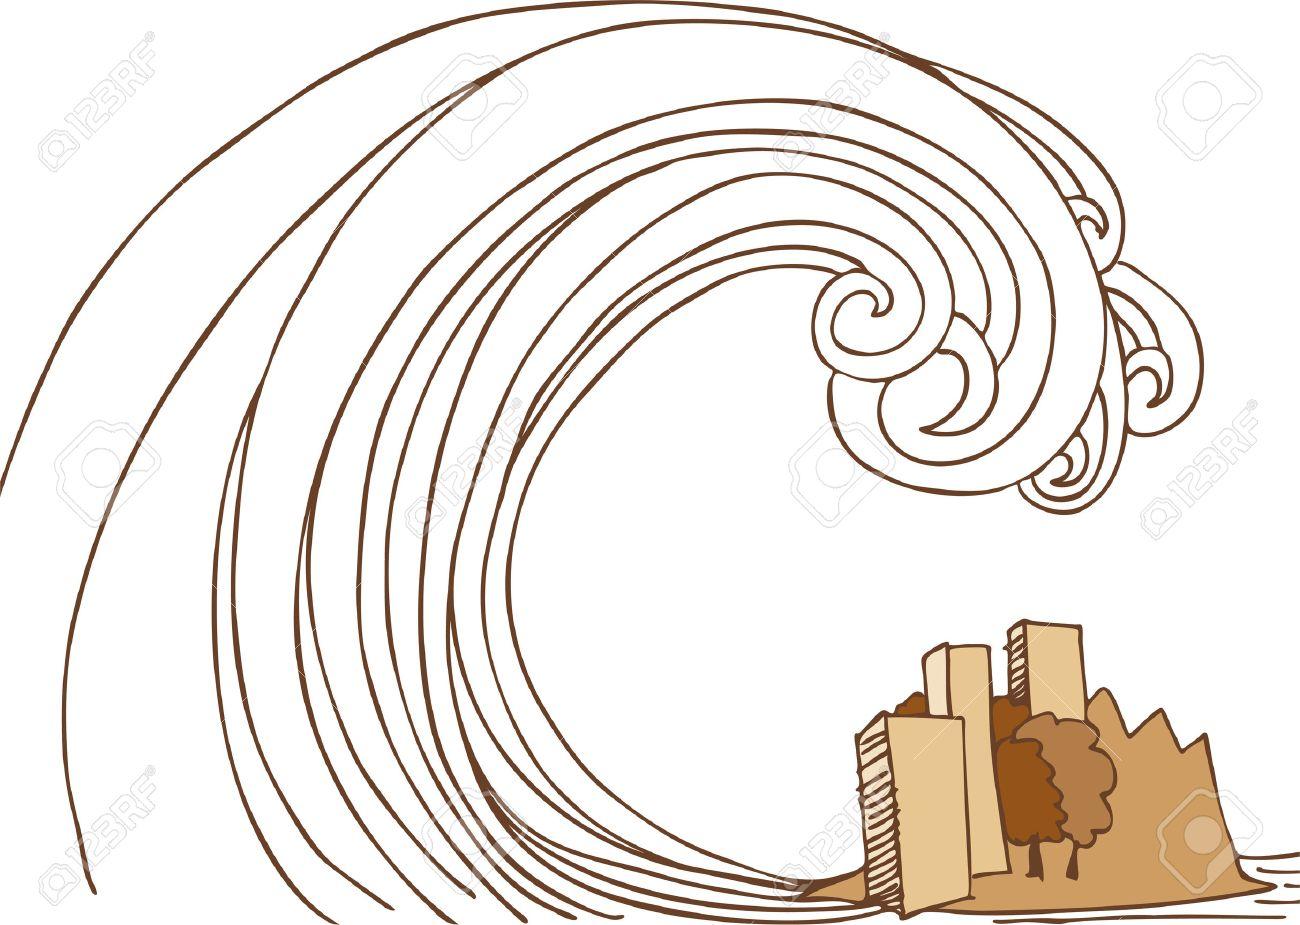 Tsunami Island : Hand drawn image of a giant wave crashing into small city. - 4957468